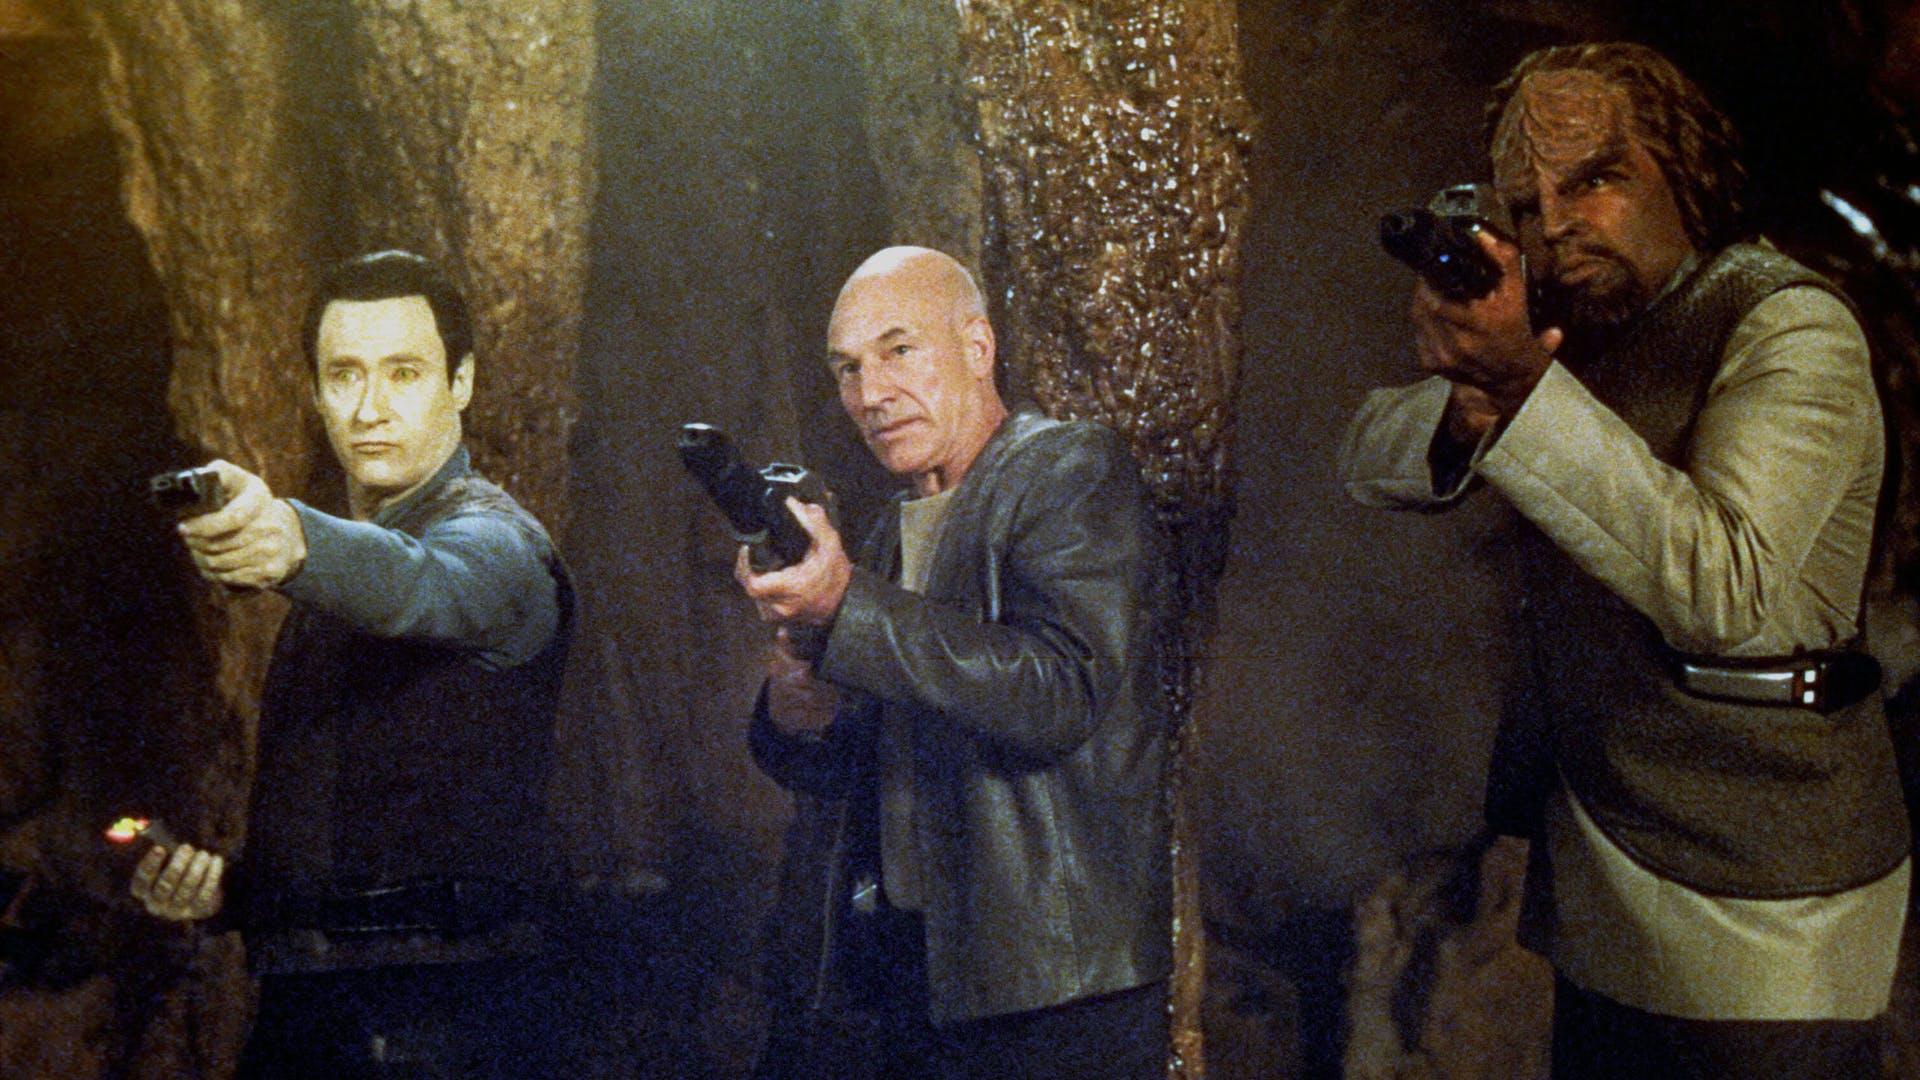 Data (Brent Spiner), Captain Picard (Patrick Stewart) and Worf (Michael Dorn) in Star Trek: Insurrection (1998)